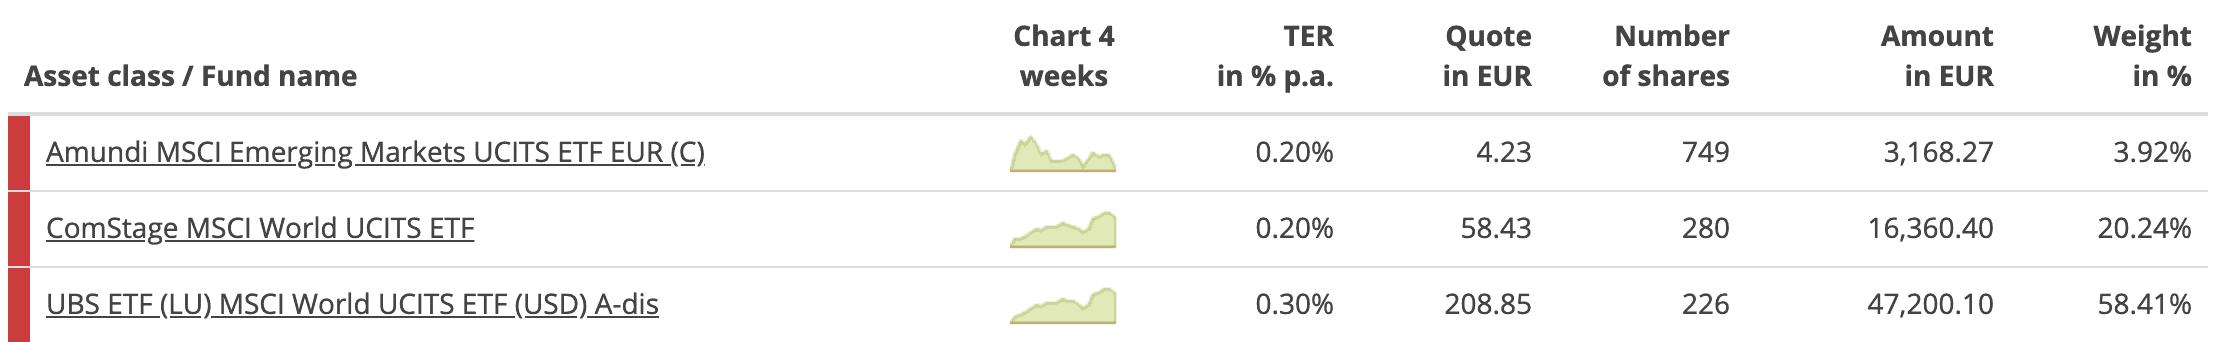 Overview of my current ETF portfolio (c) justetf.com